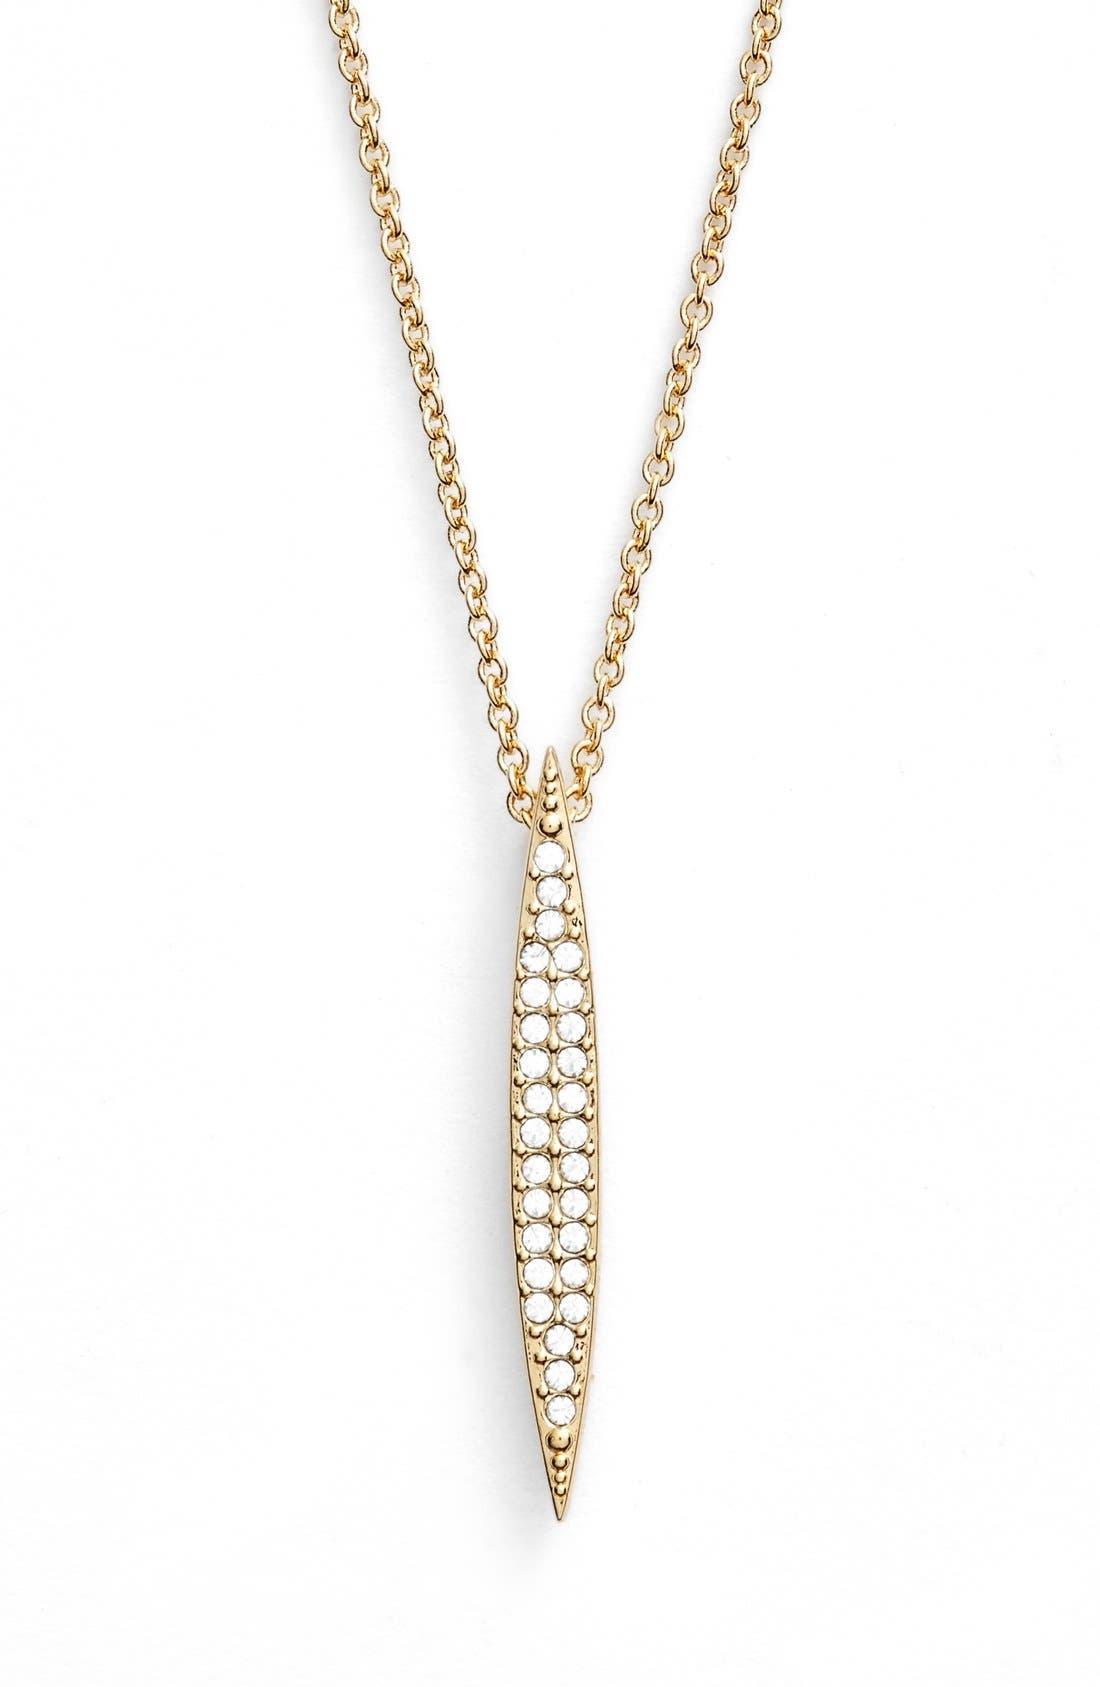 Main Image - Nadri 'Tattoo' Spear Pendant Necklace